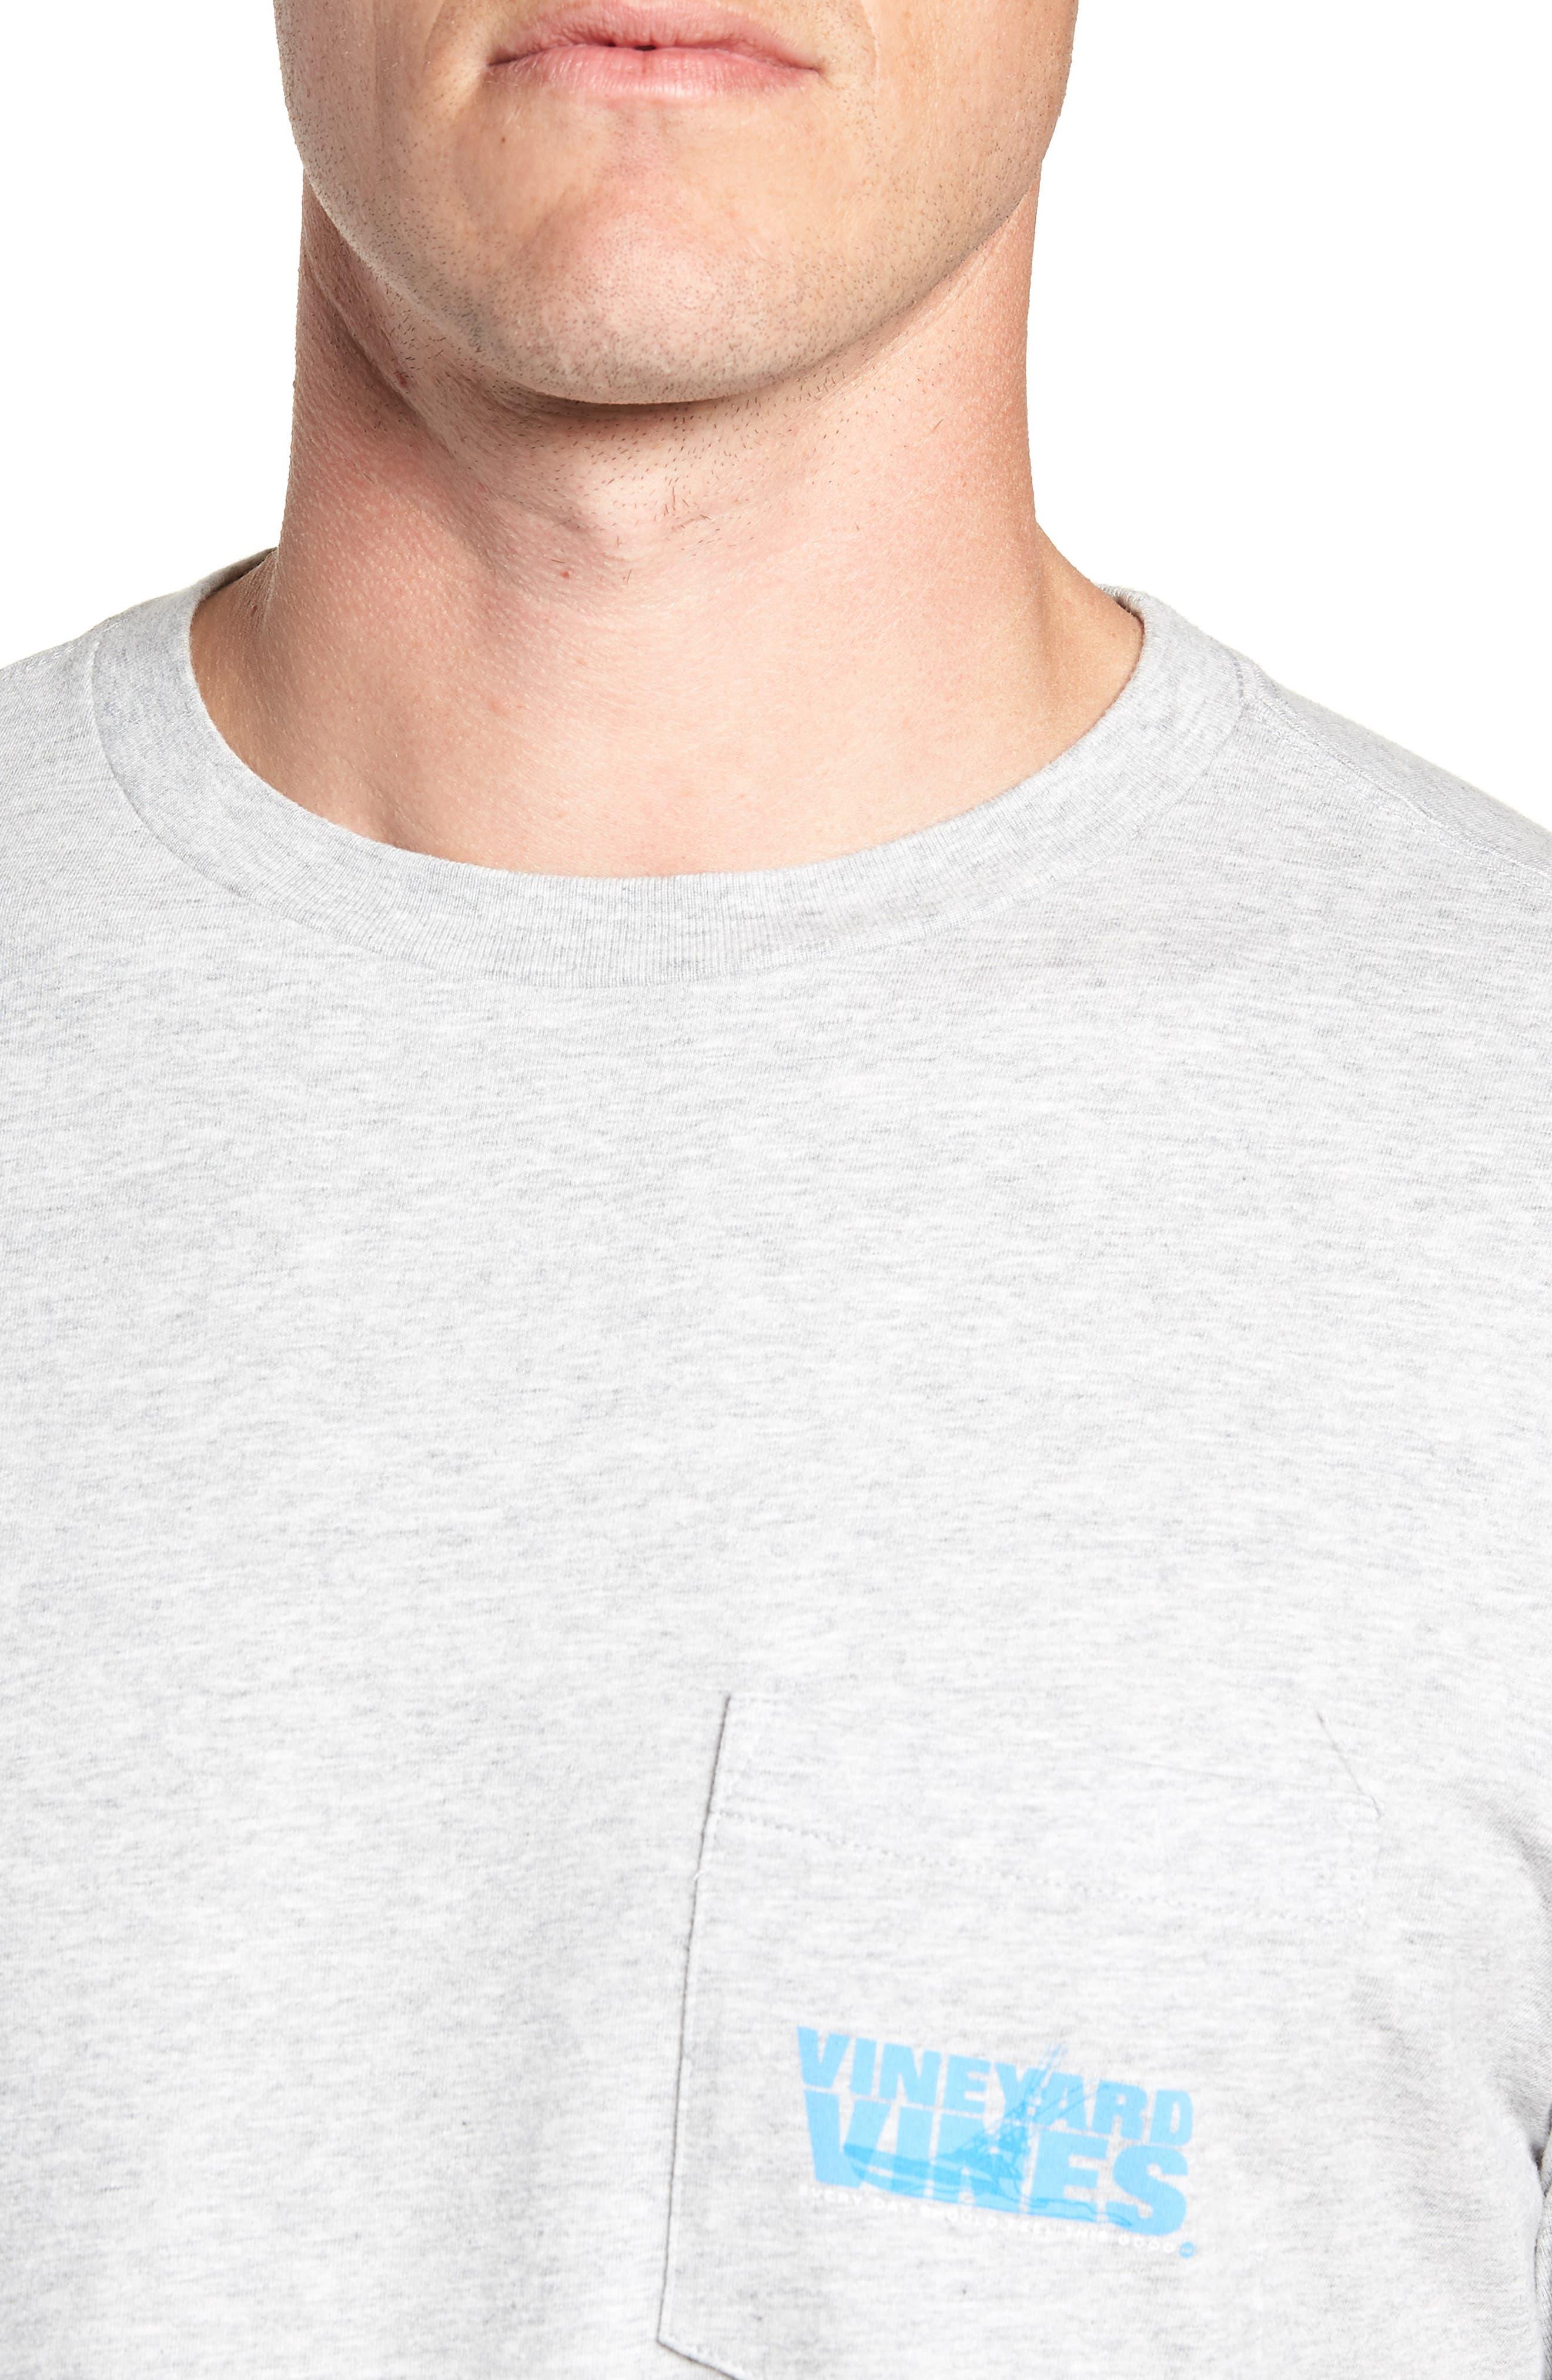 Knockout Sportfisher T-Shirt,                             Alternate thumbnail 4, color,                             GRAY HEATHER